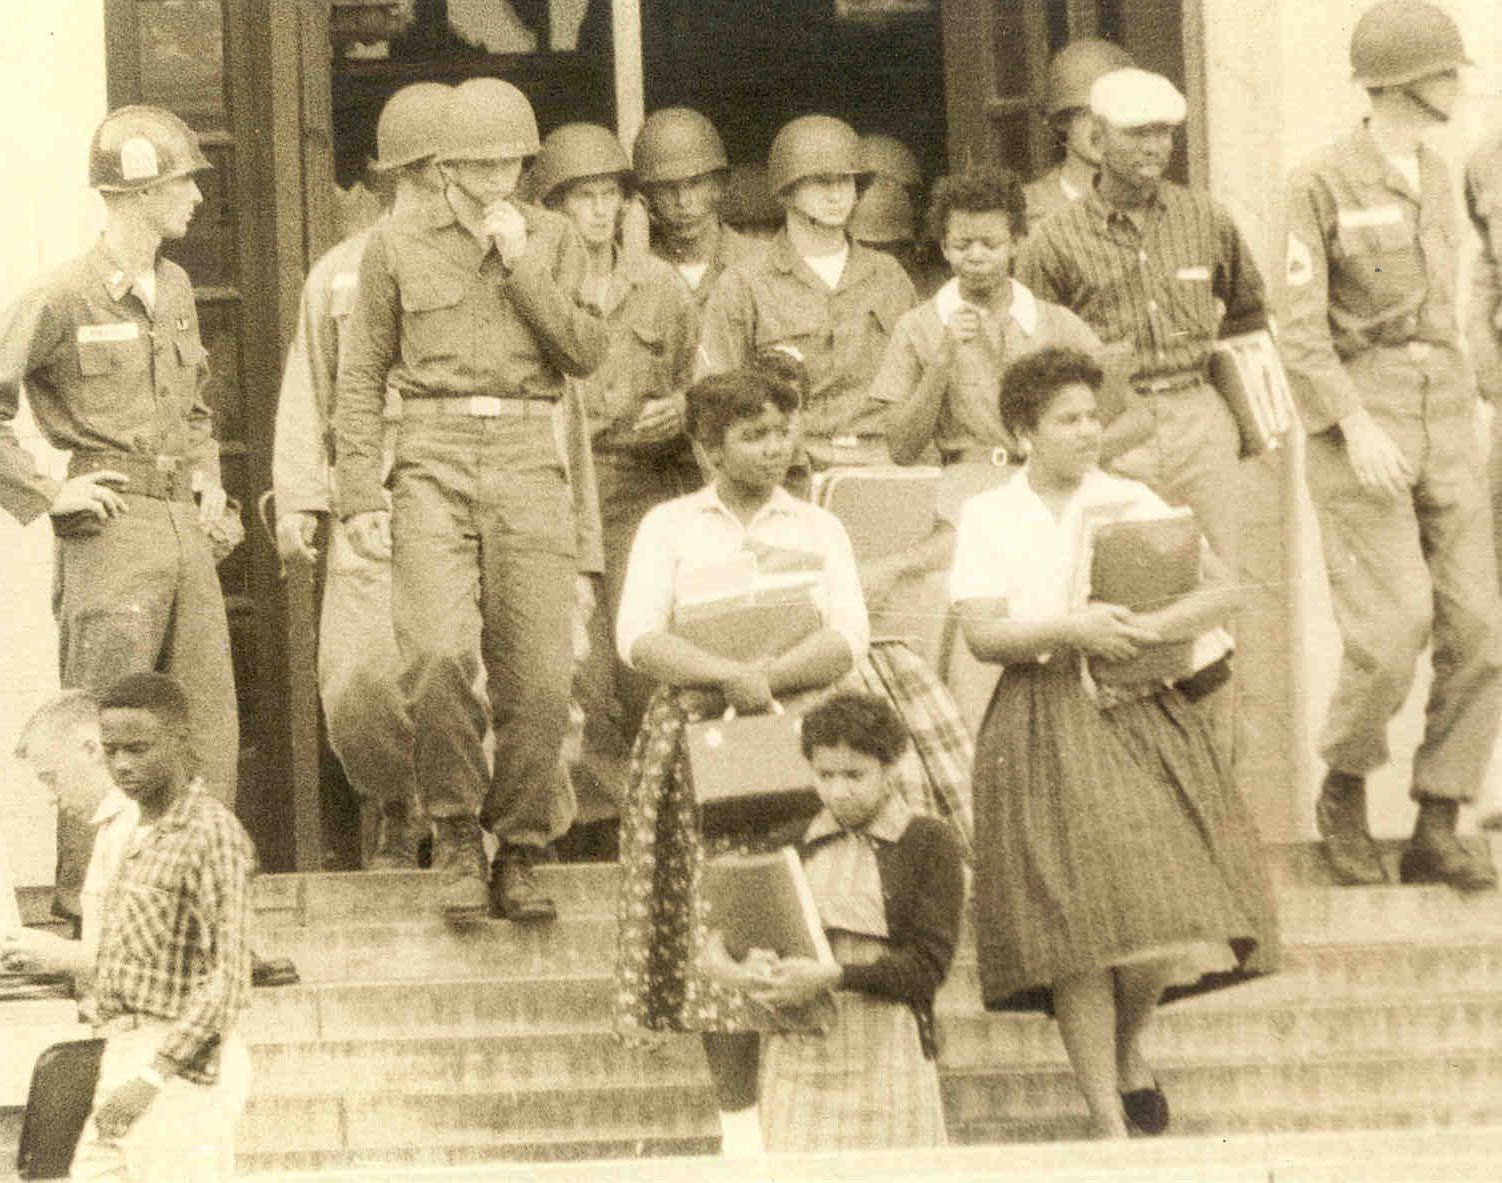 http://ualr.edu/race-ethnicity/melba-pattillo-beals-the-little-rock-nine/